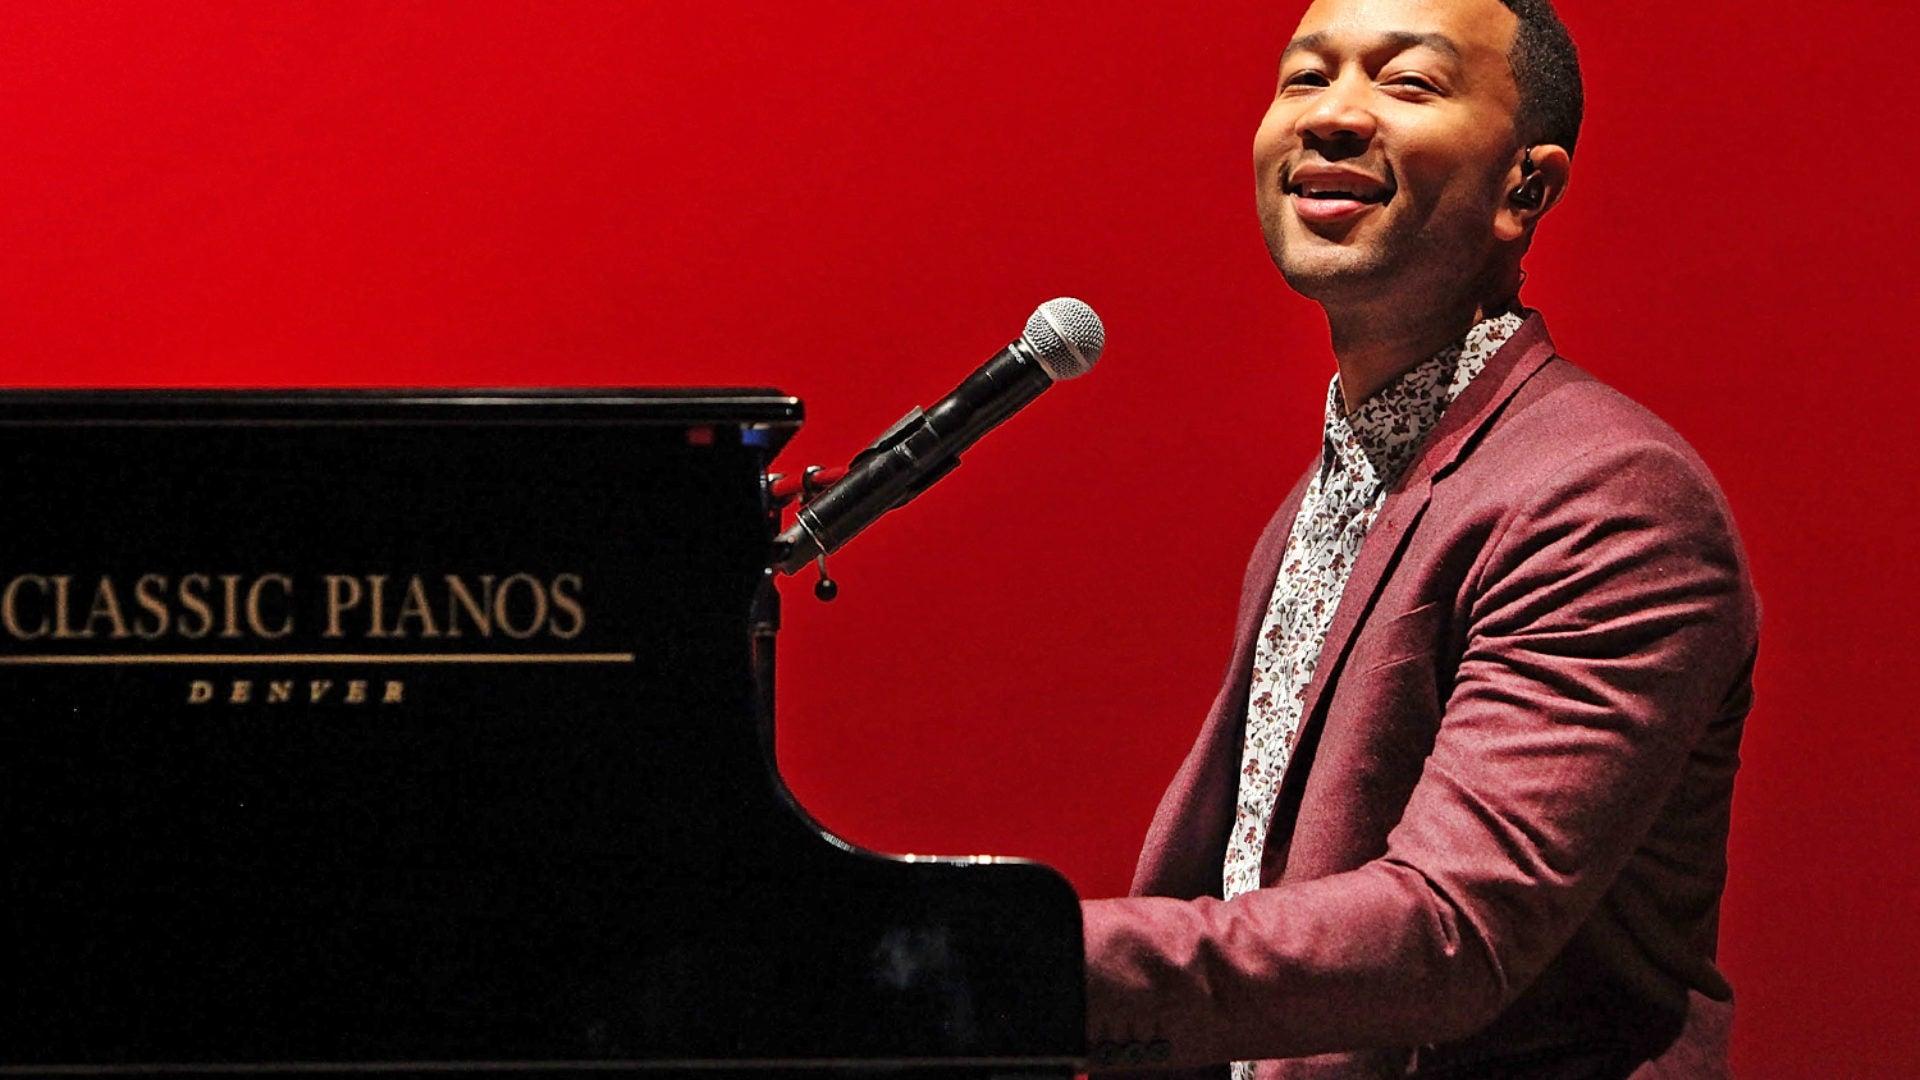 John Legend Reads Donald Trump Jr on Twitter, Calls Presidential Candidate 'Racist'